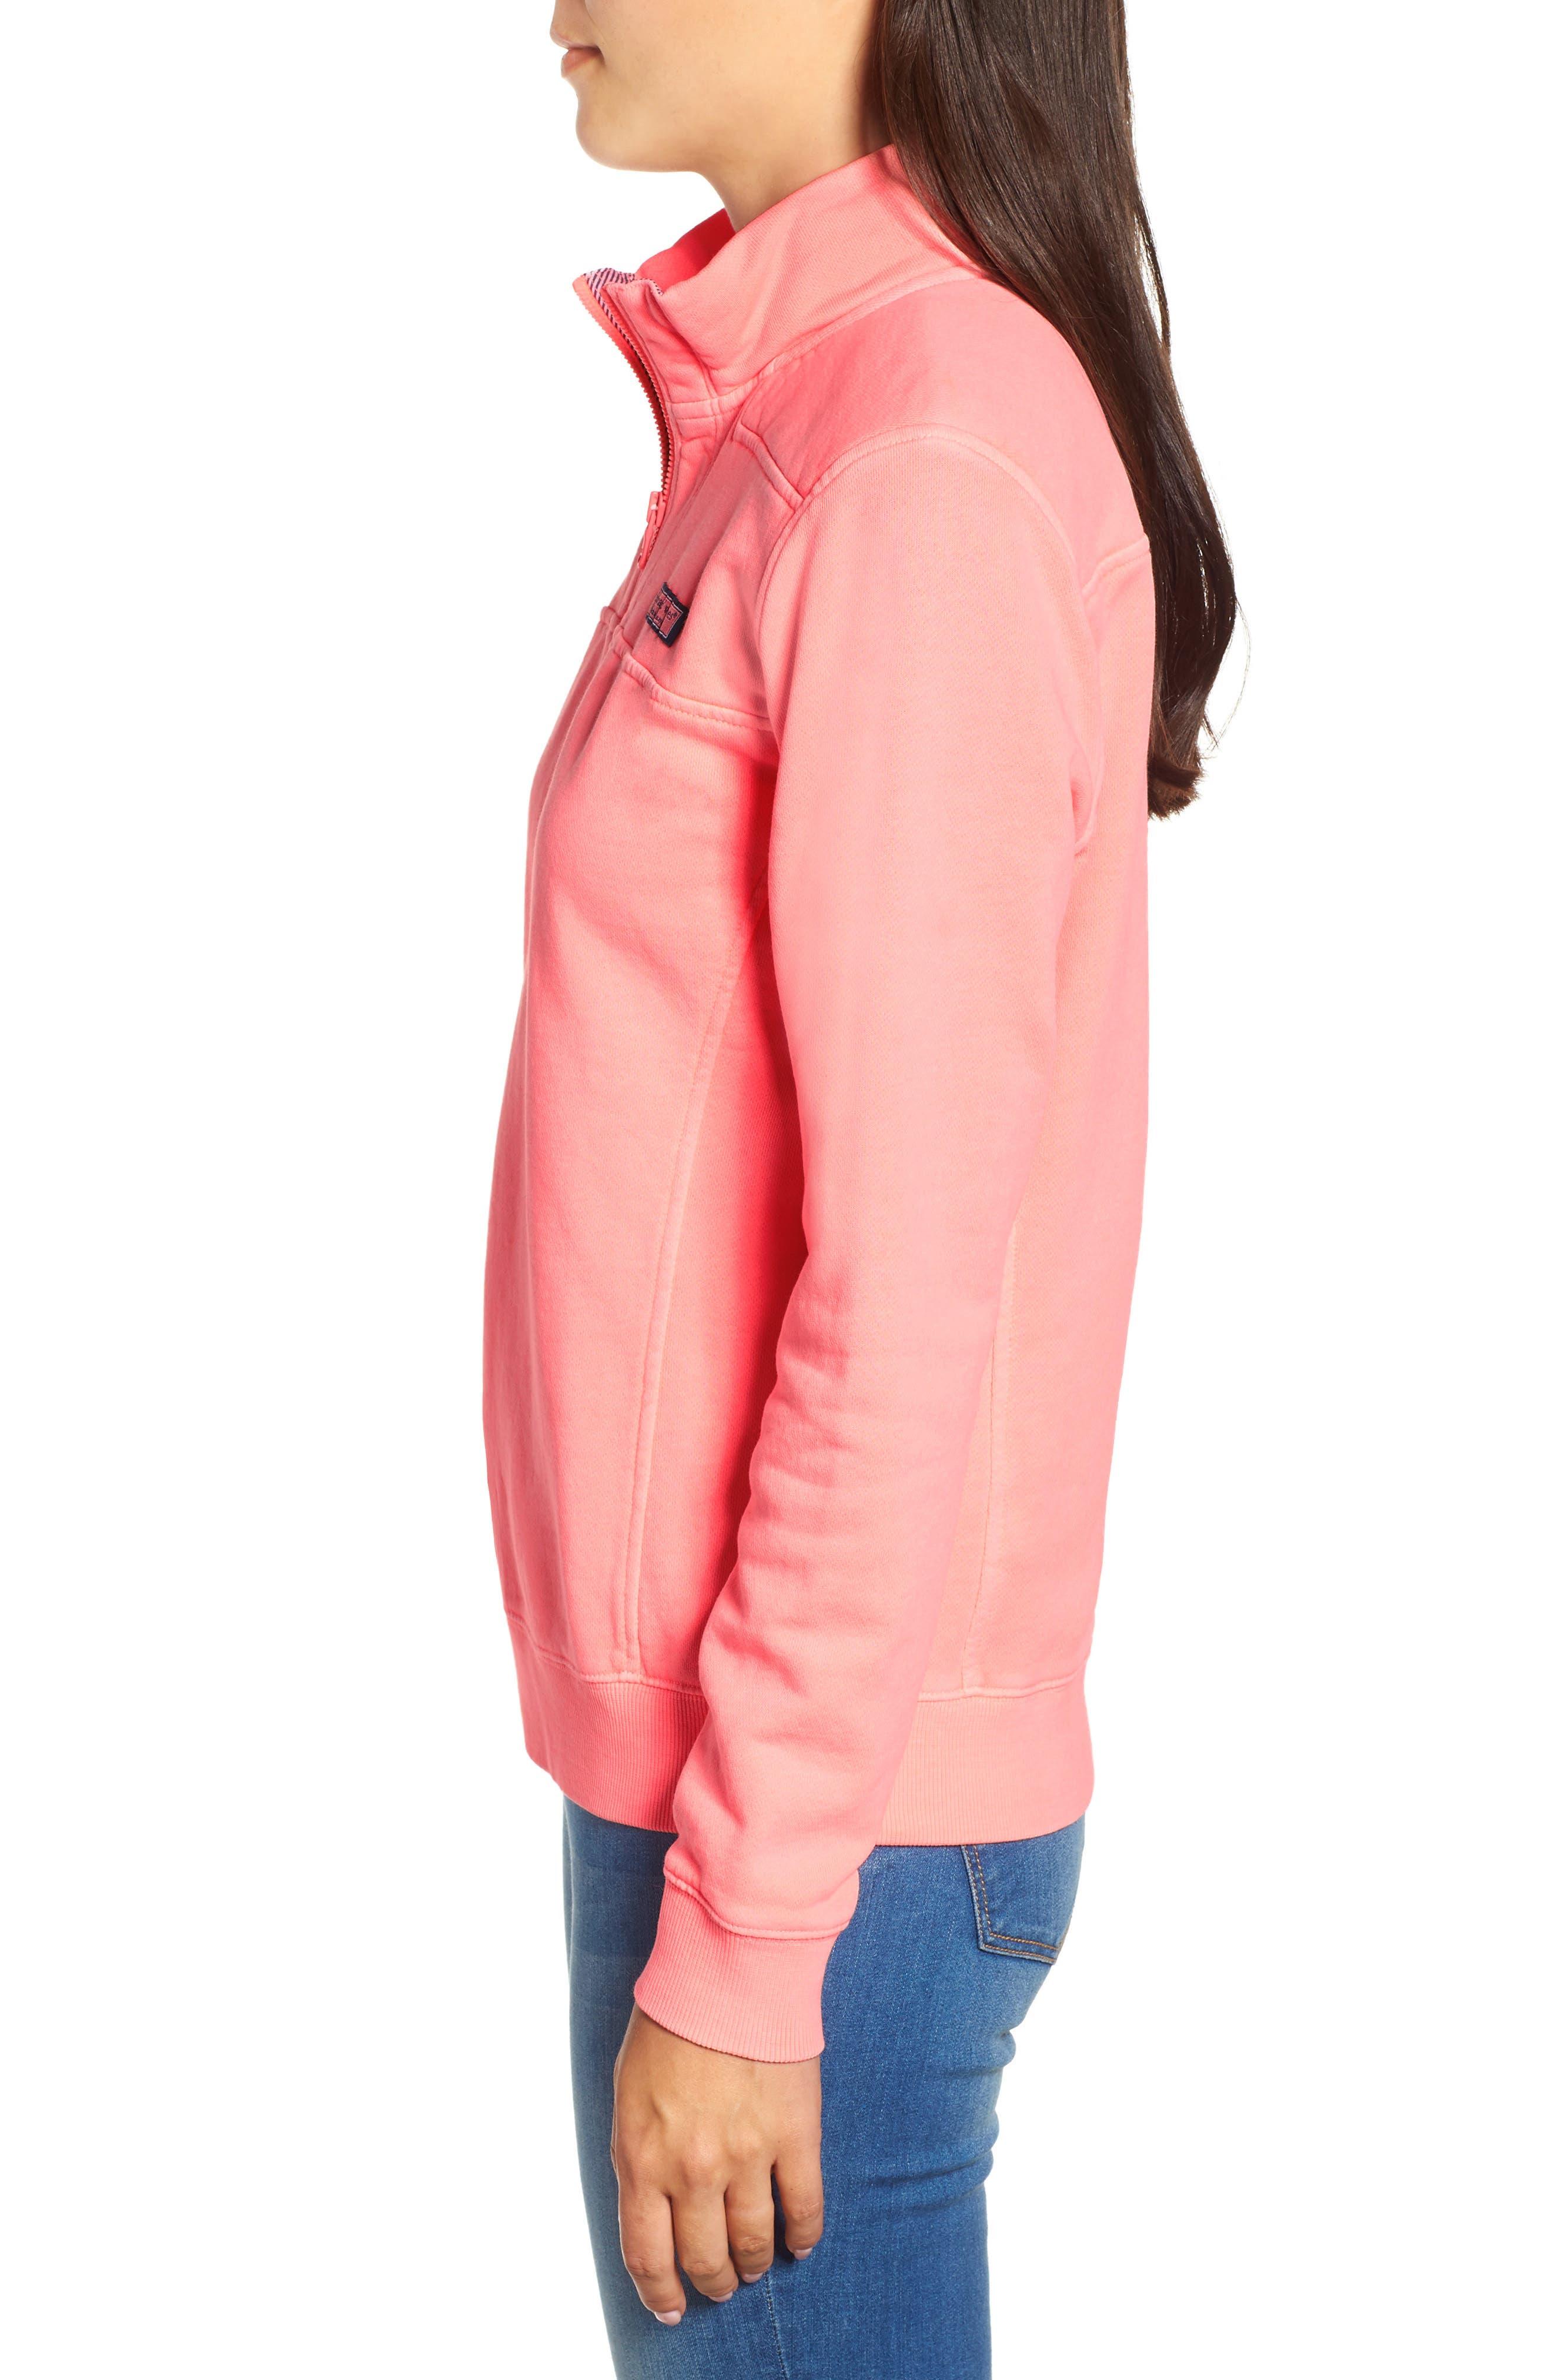 VINEYARD VINES,                             Garment Dyed Classic Shep Pullover,                             Alternate thumbnail 3, color,                             655